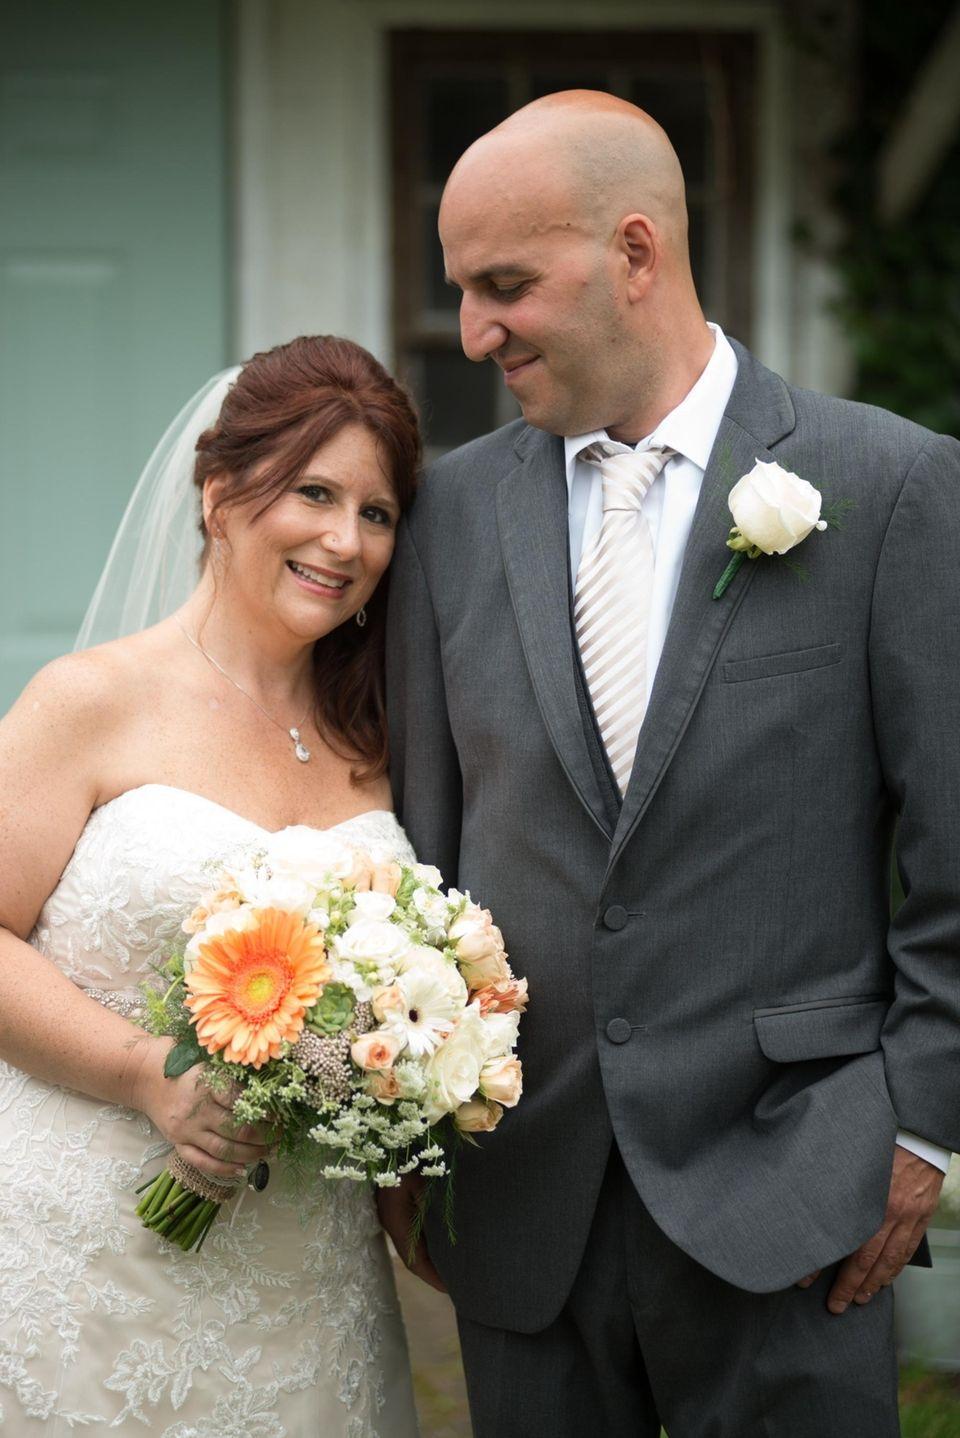 Mr. & Mrs. DeCola